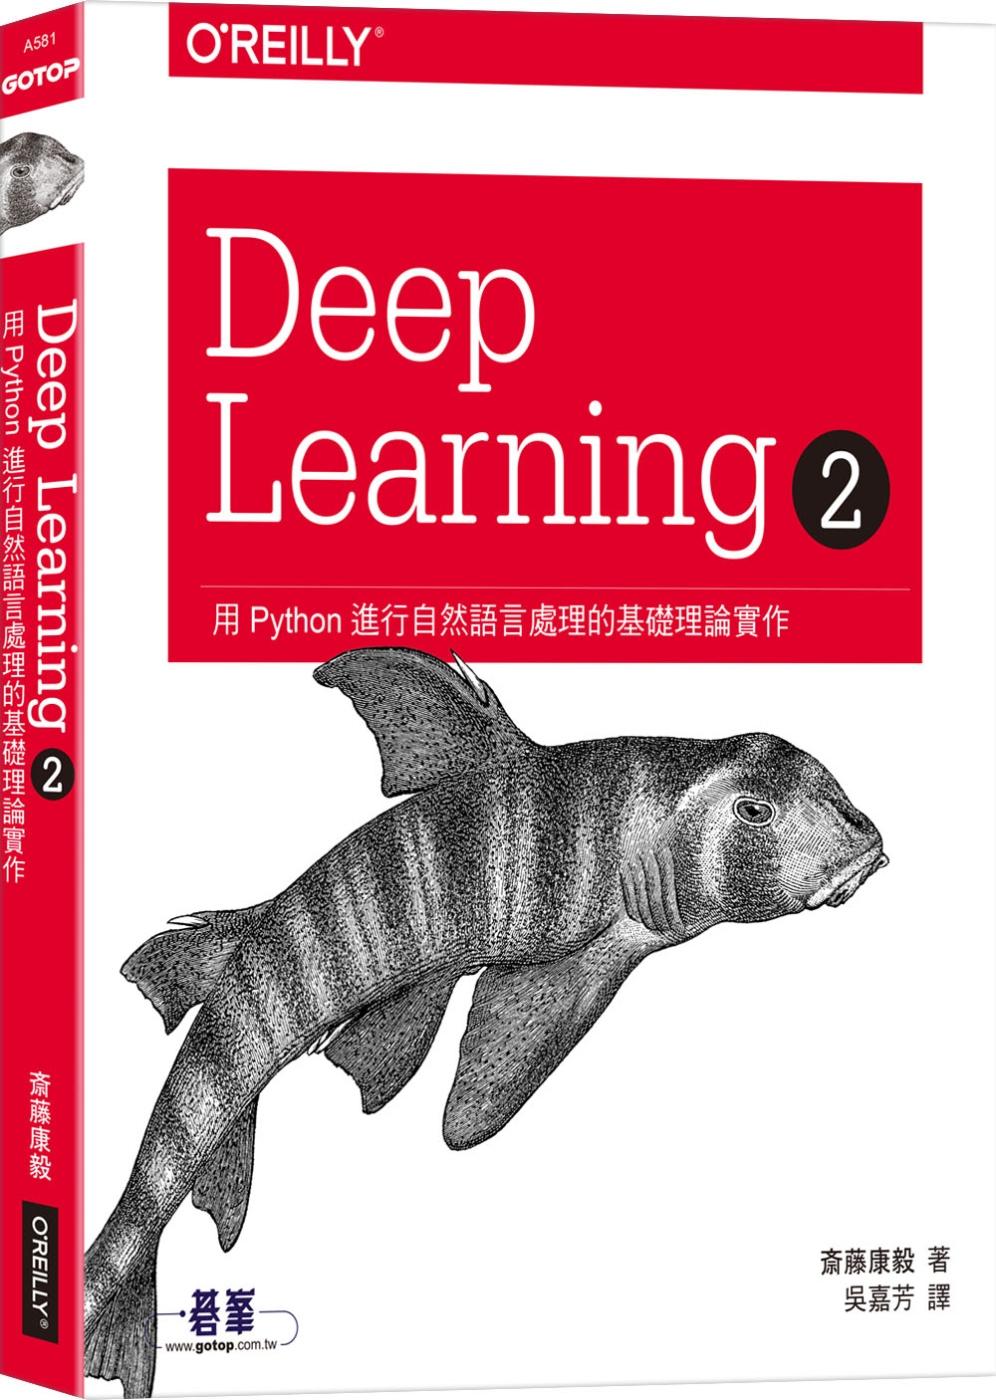 Deep Learning 2 用Python進行自然語言處理的基礎理論實作